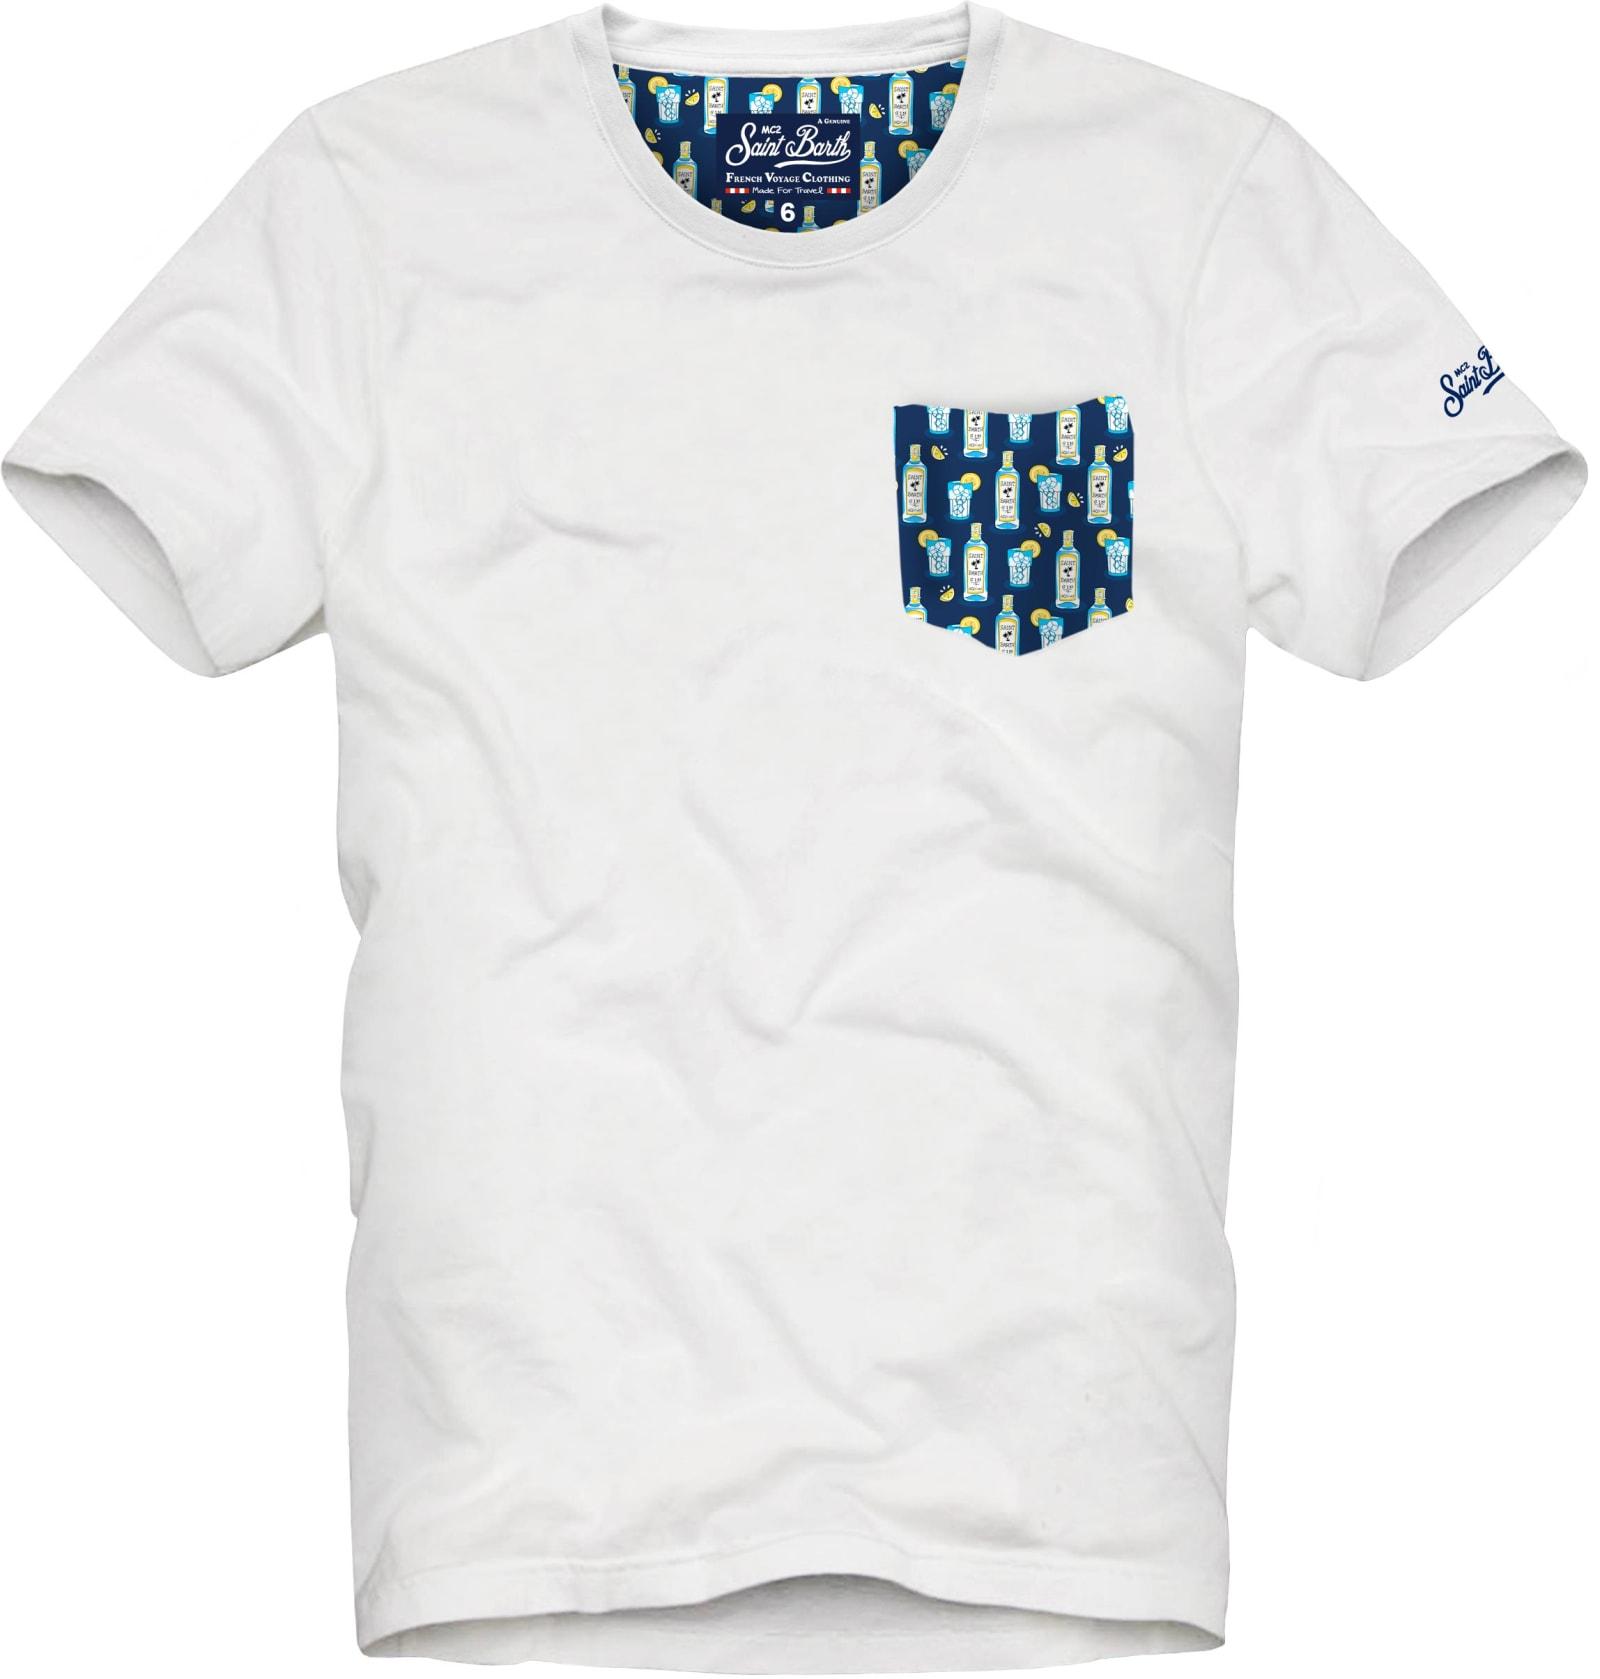 MC2 Saint Barth Micro Gin Tonic Print Pocket Man T-shirt